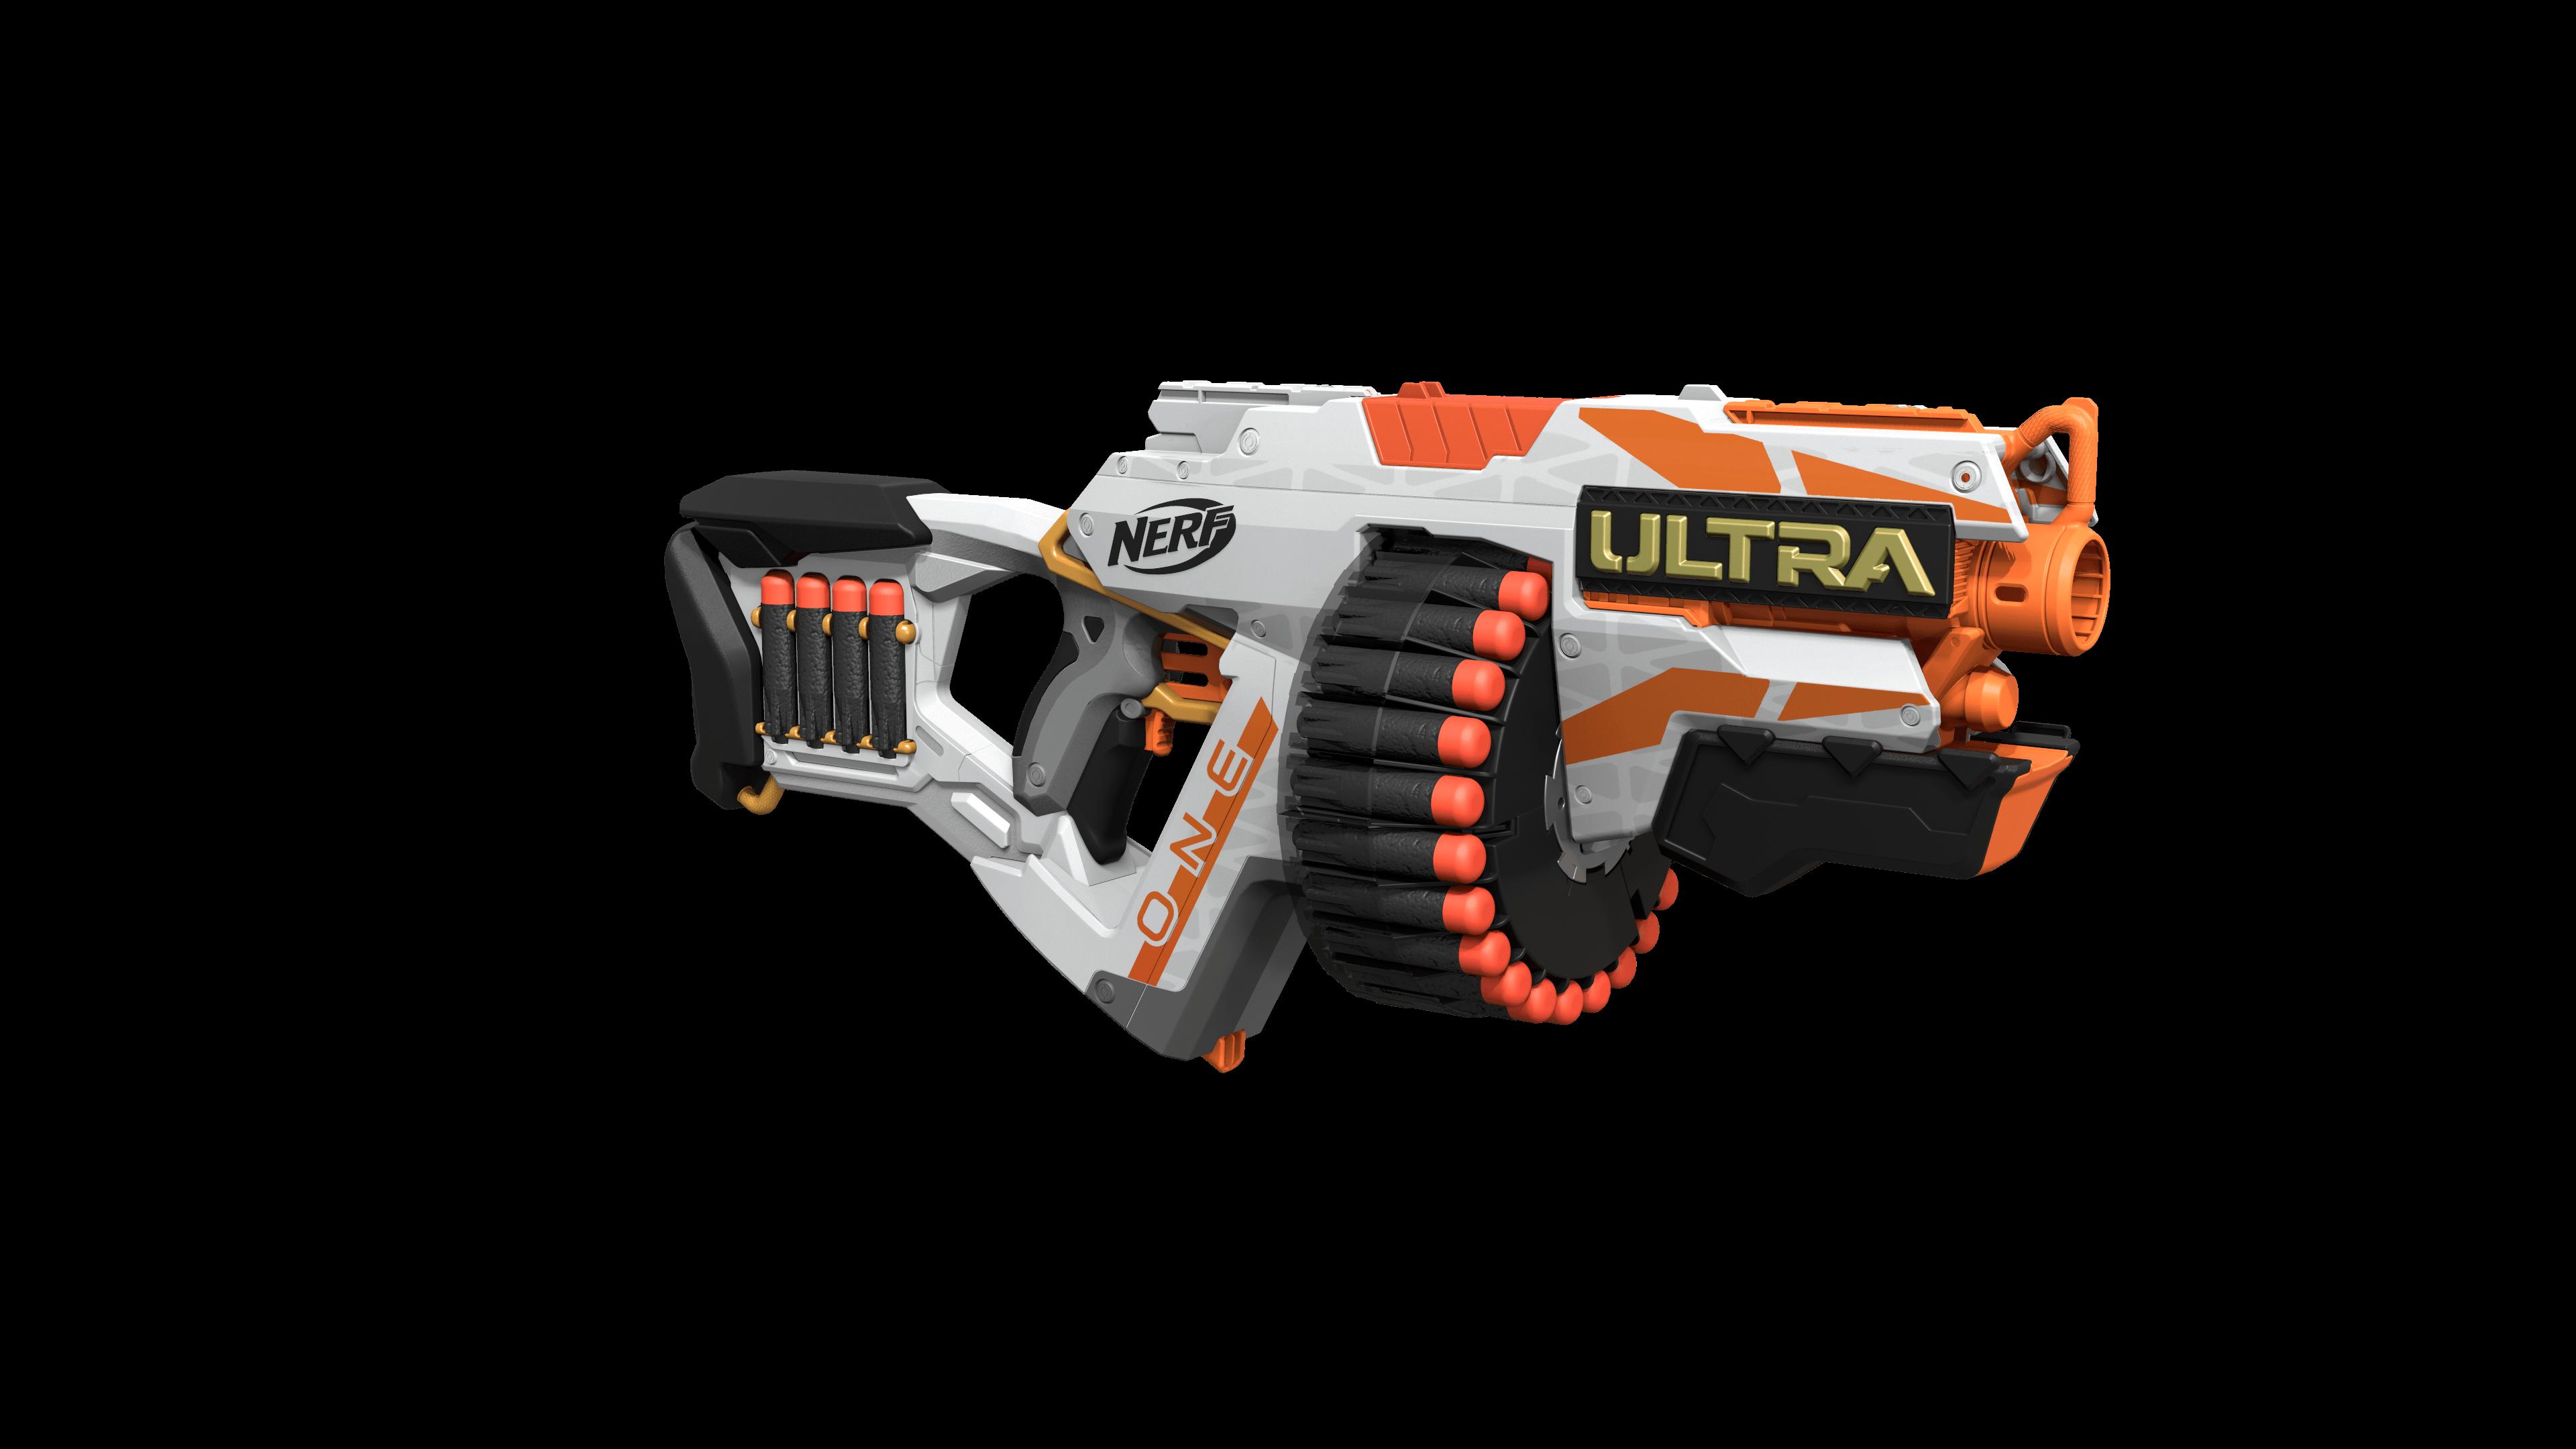 ultra blaster img 109